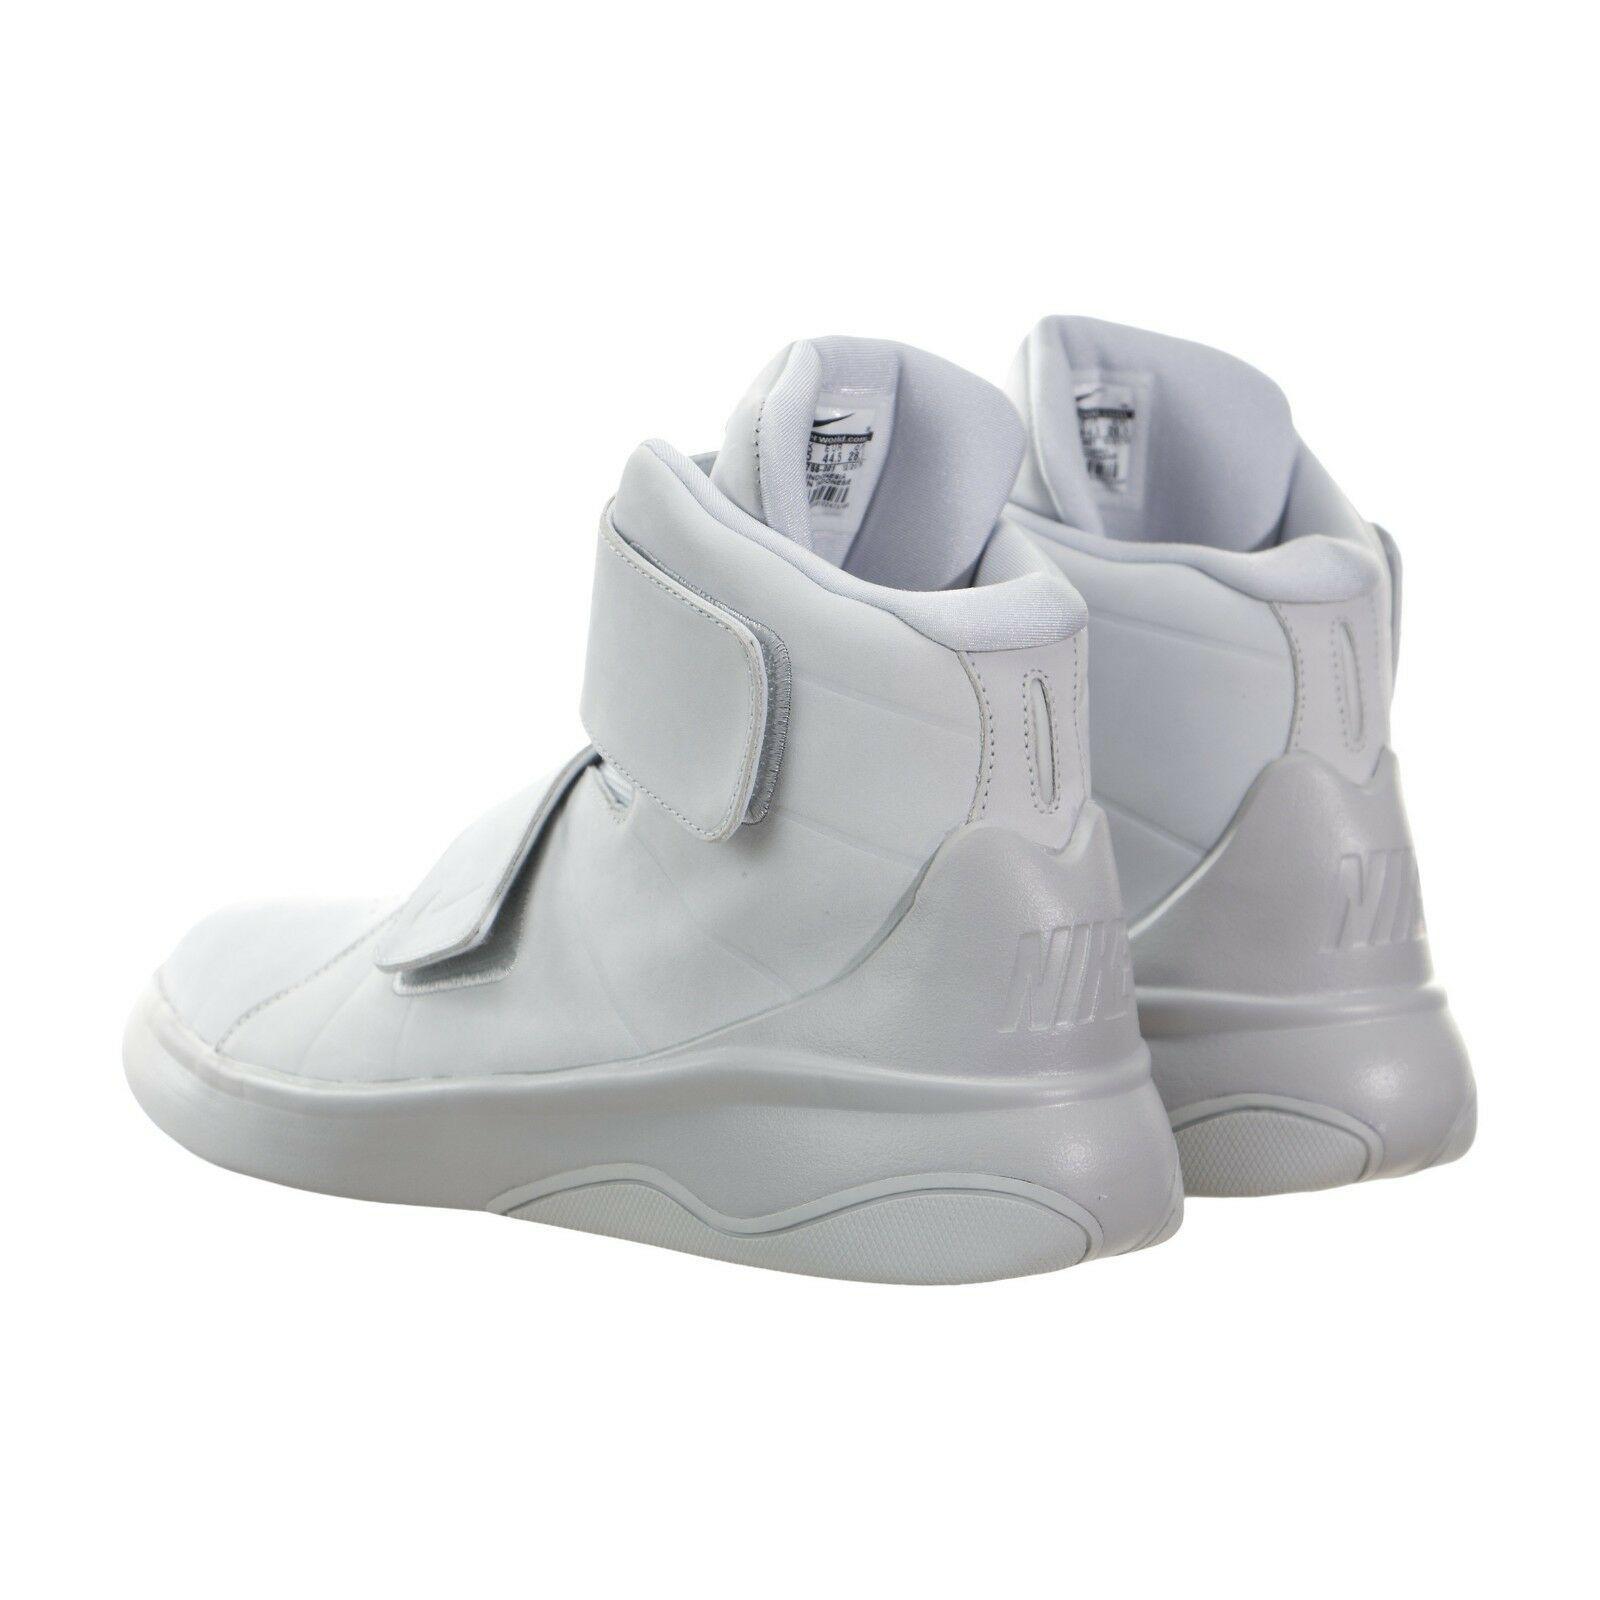 Nike Marxman PRM Pure Platinum 832766-001 Mens Strap Sneaker Shoes